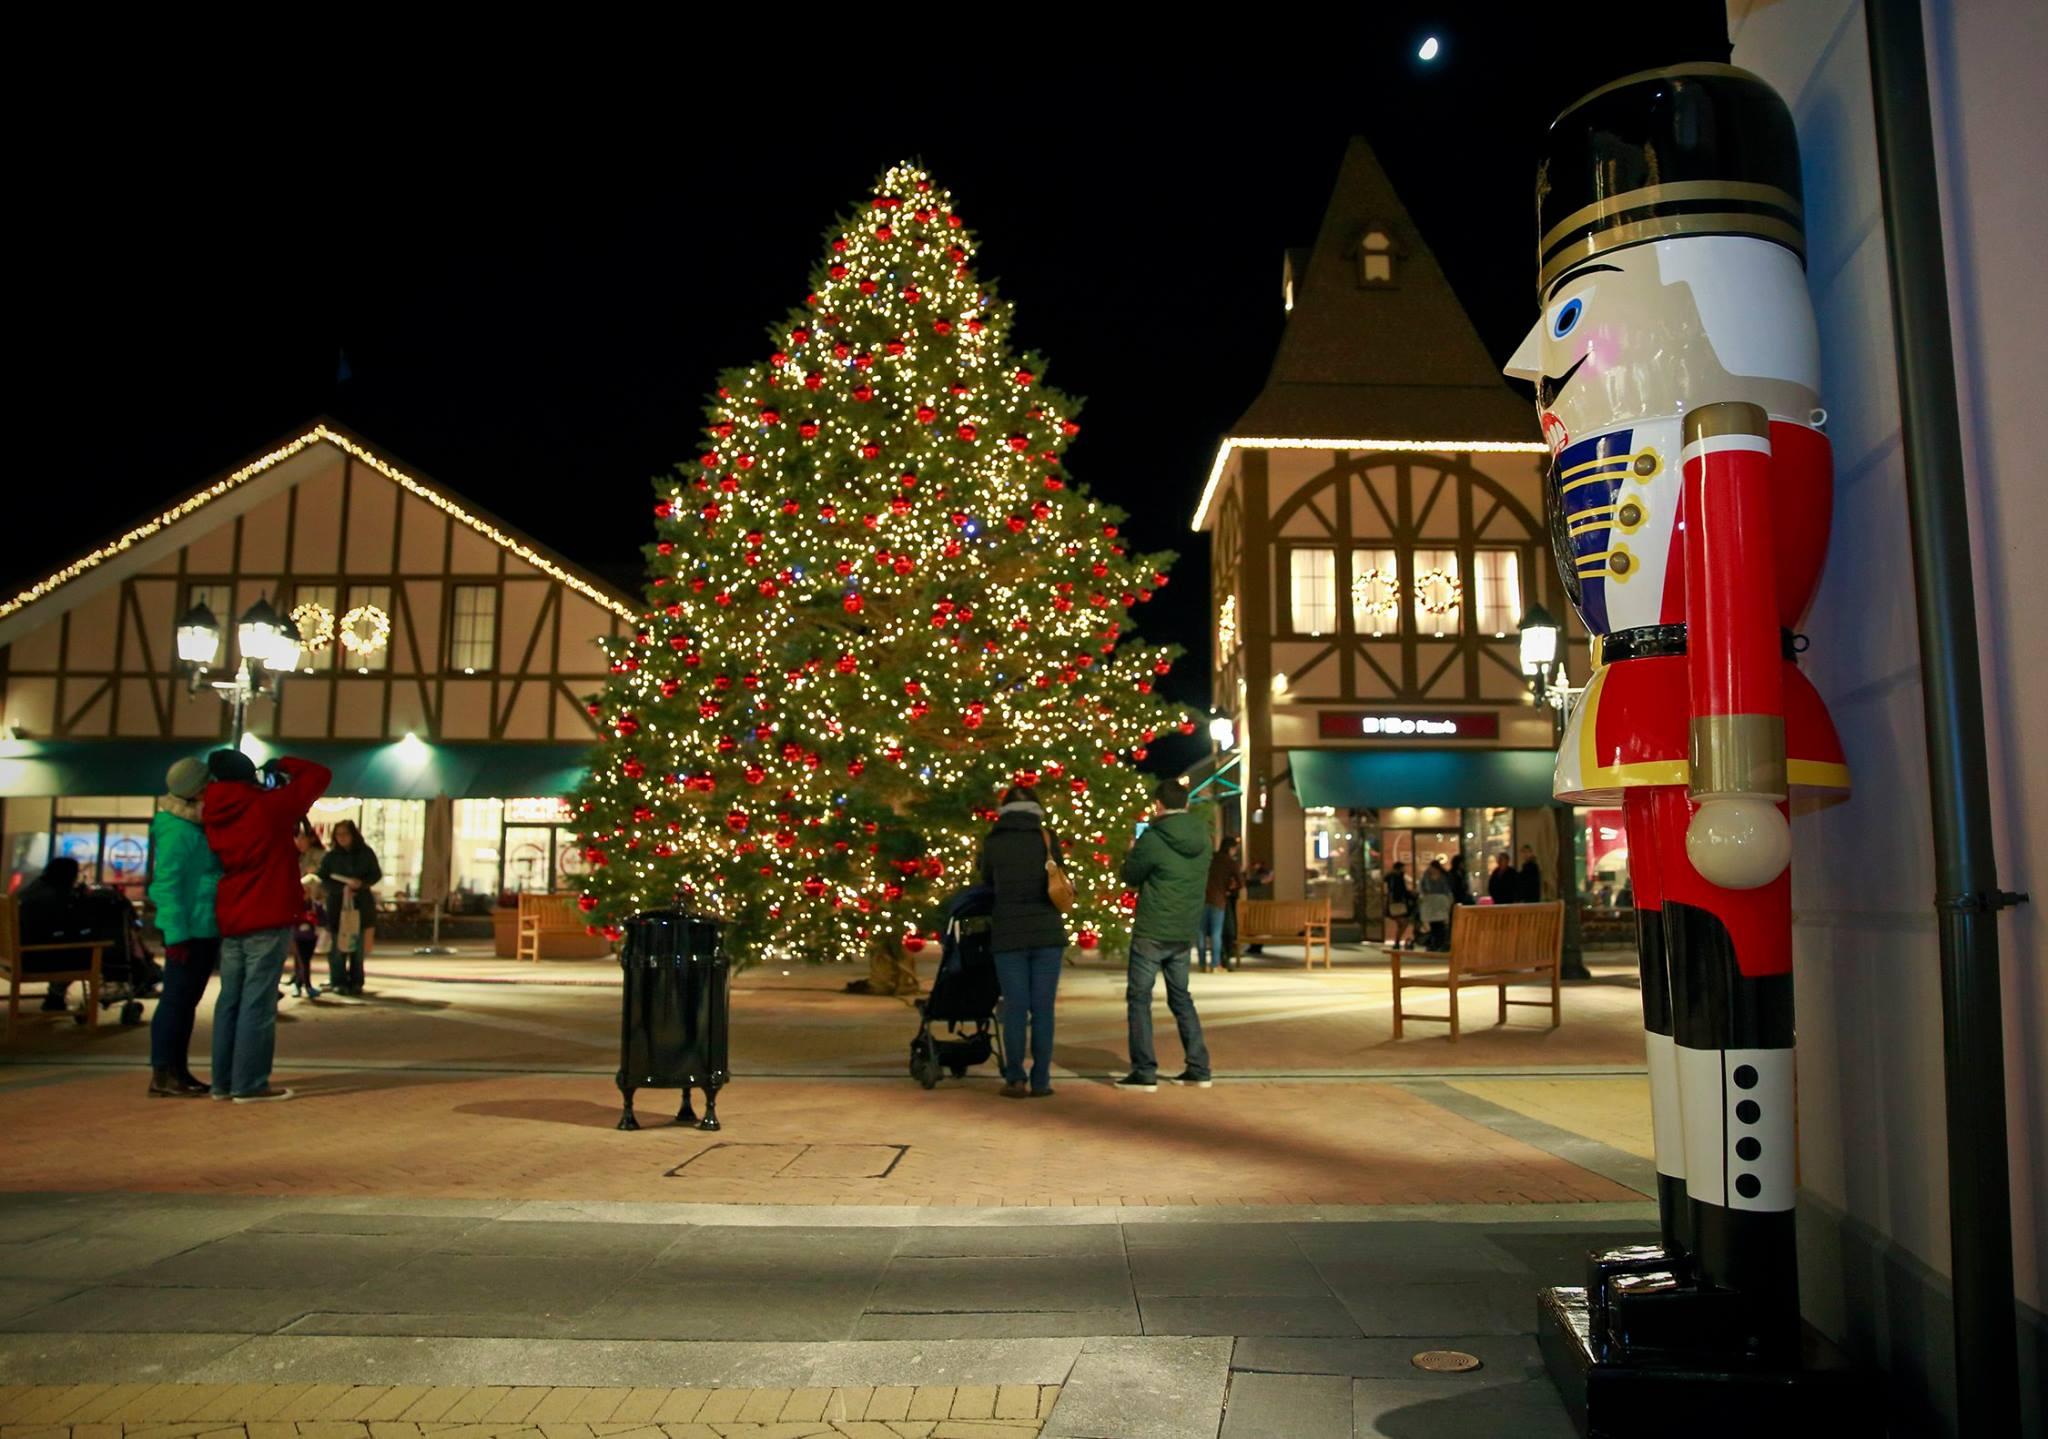 Christmas lights at McArthurGlen (McArthurGlen/Facebook)